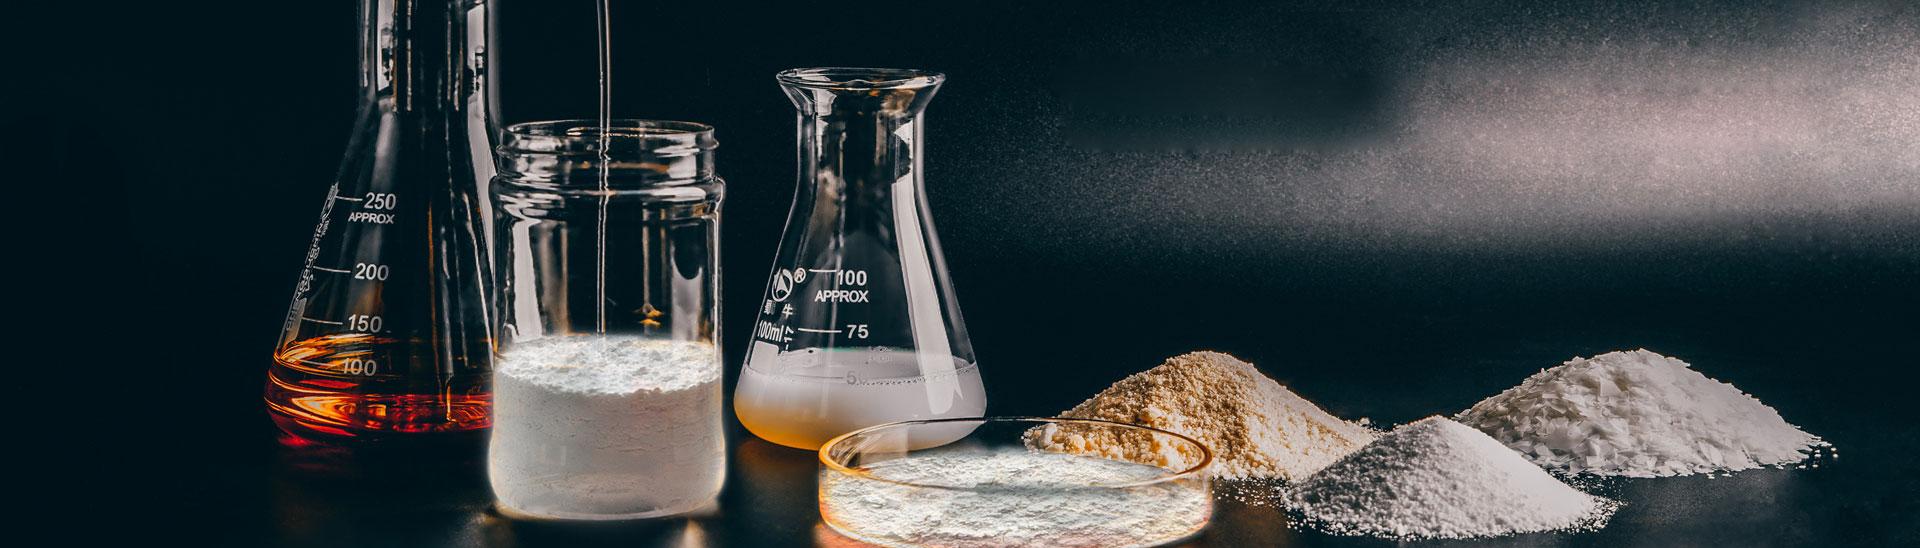 zinc-oxide-nanoparticles